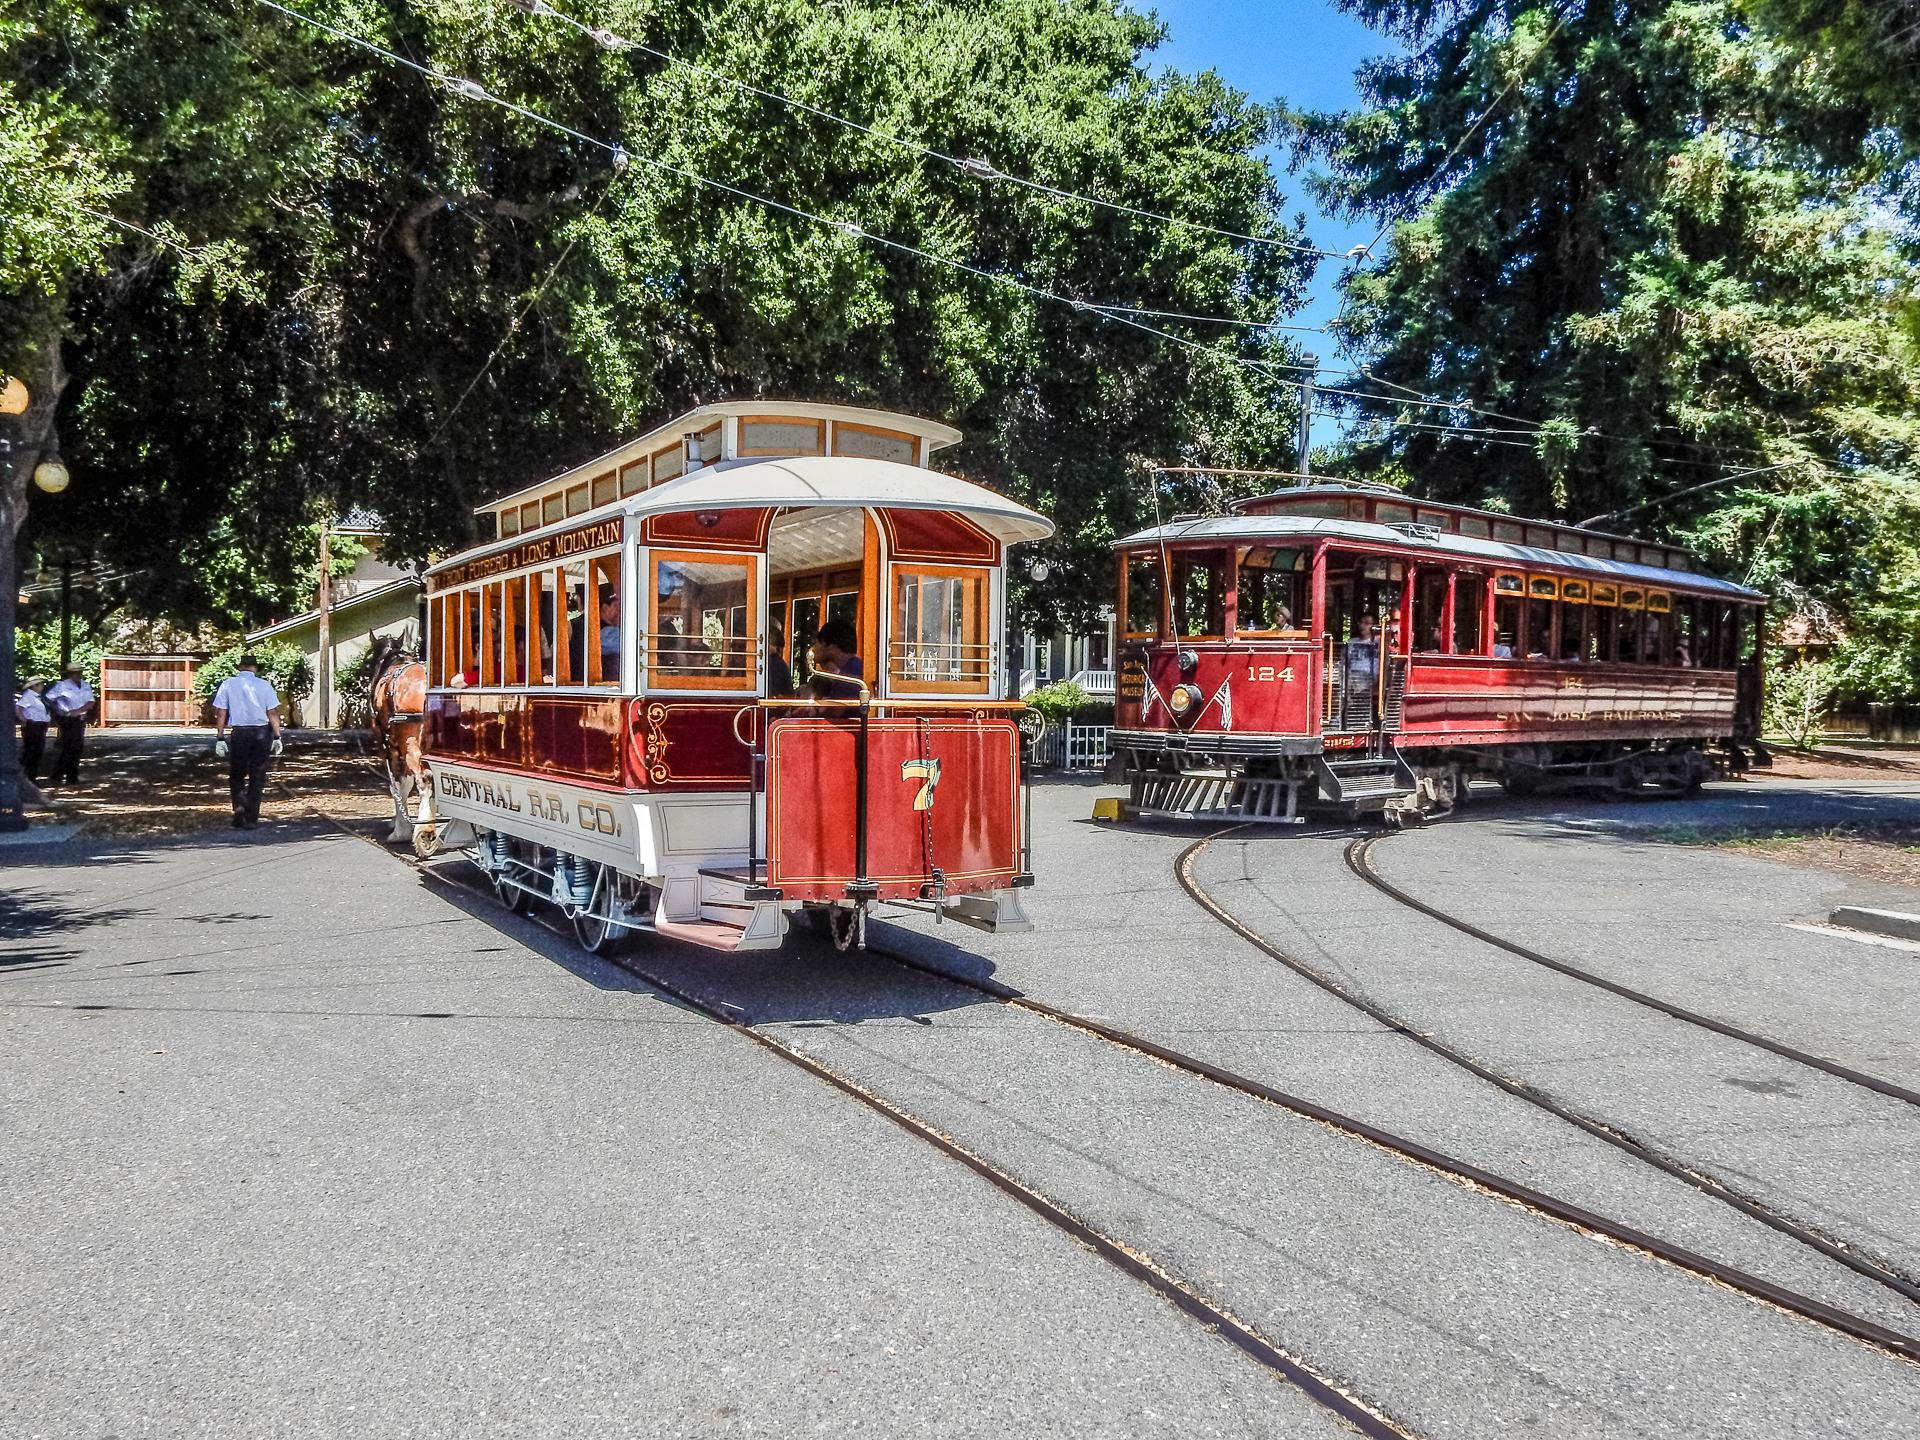 Central Rr 7 And San Jose Railroads 124 Trains Magazine